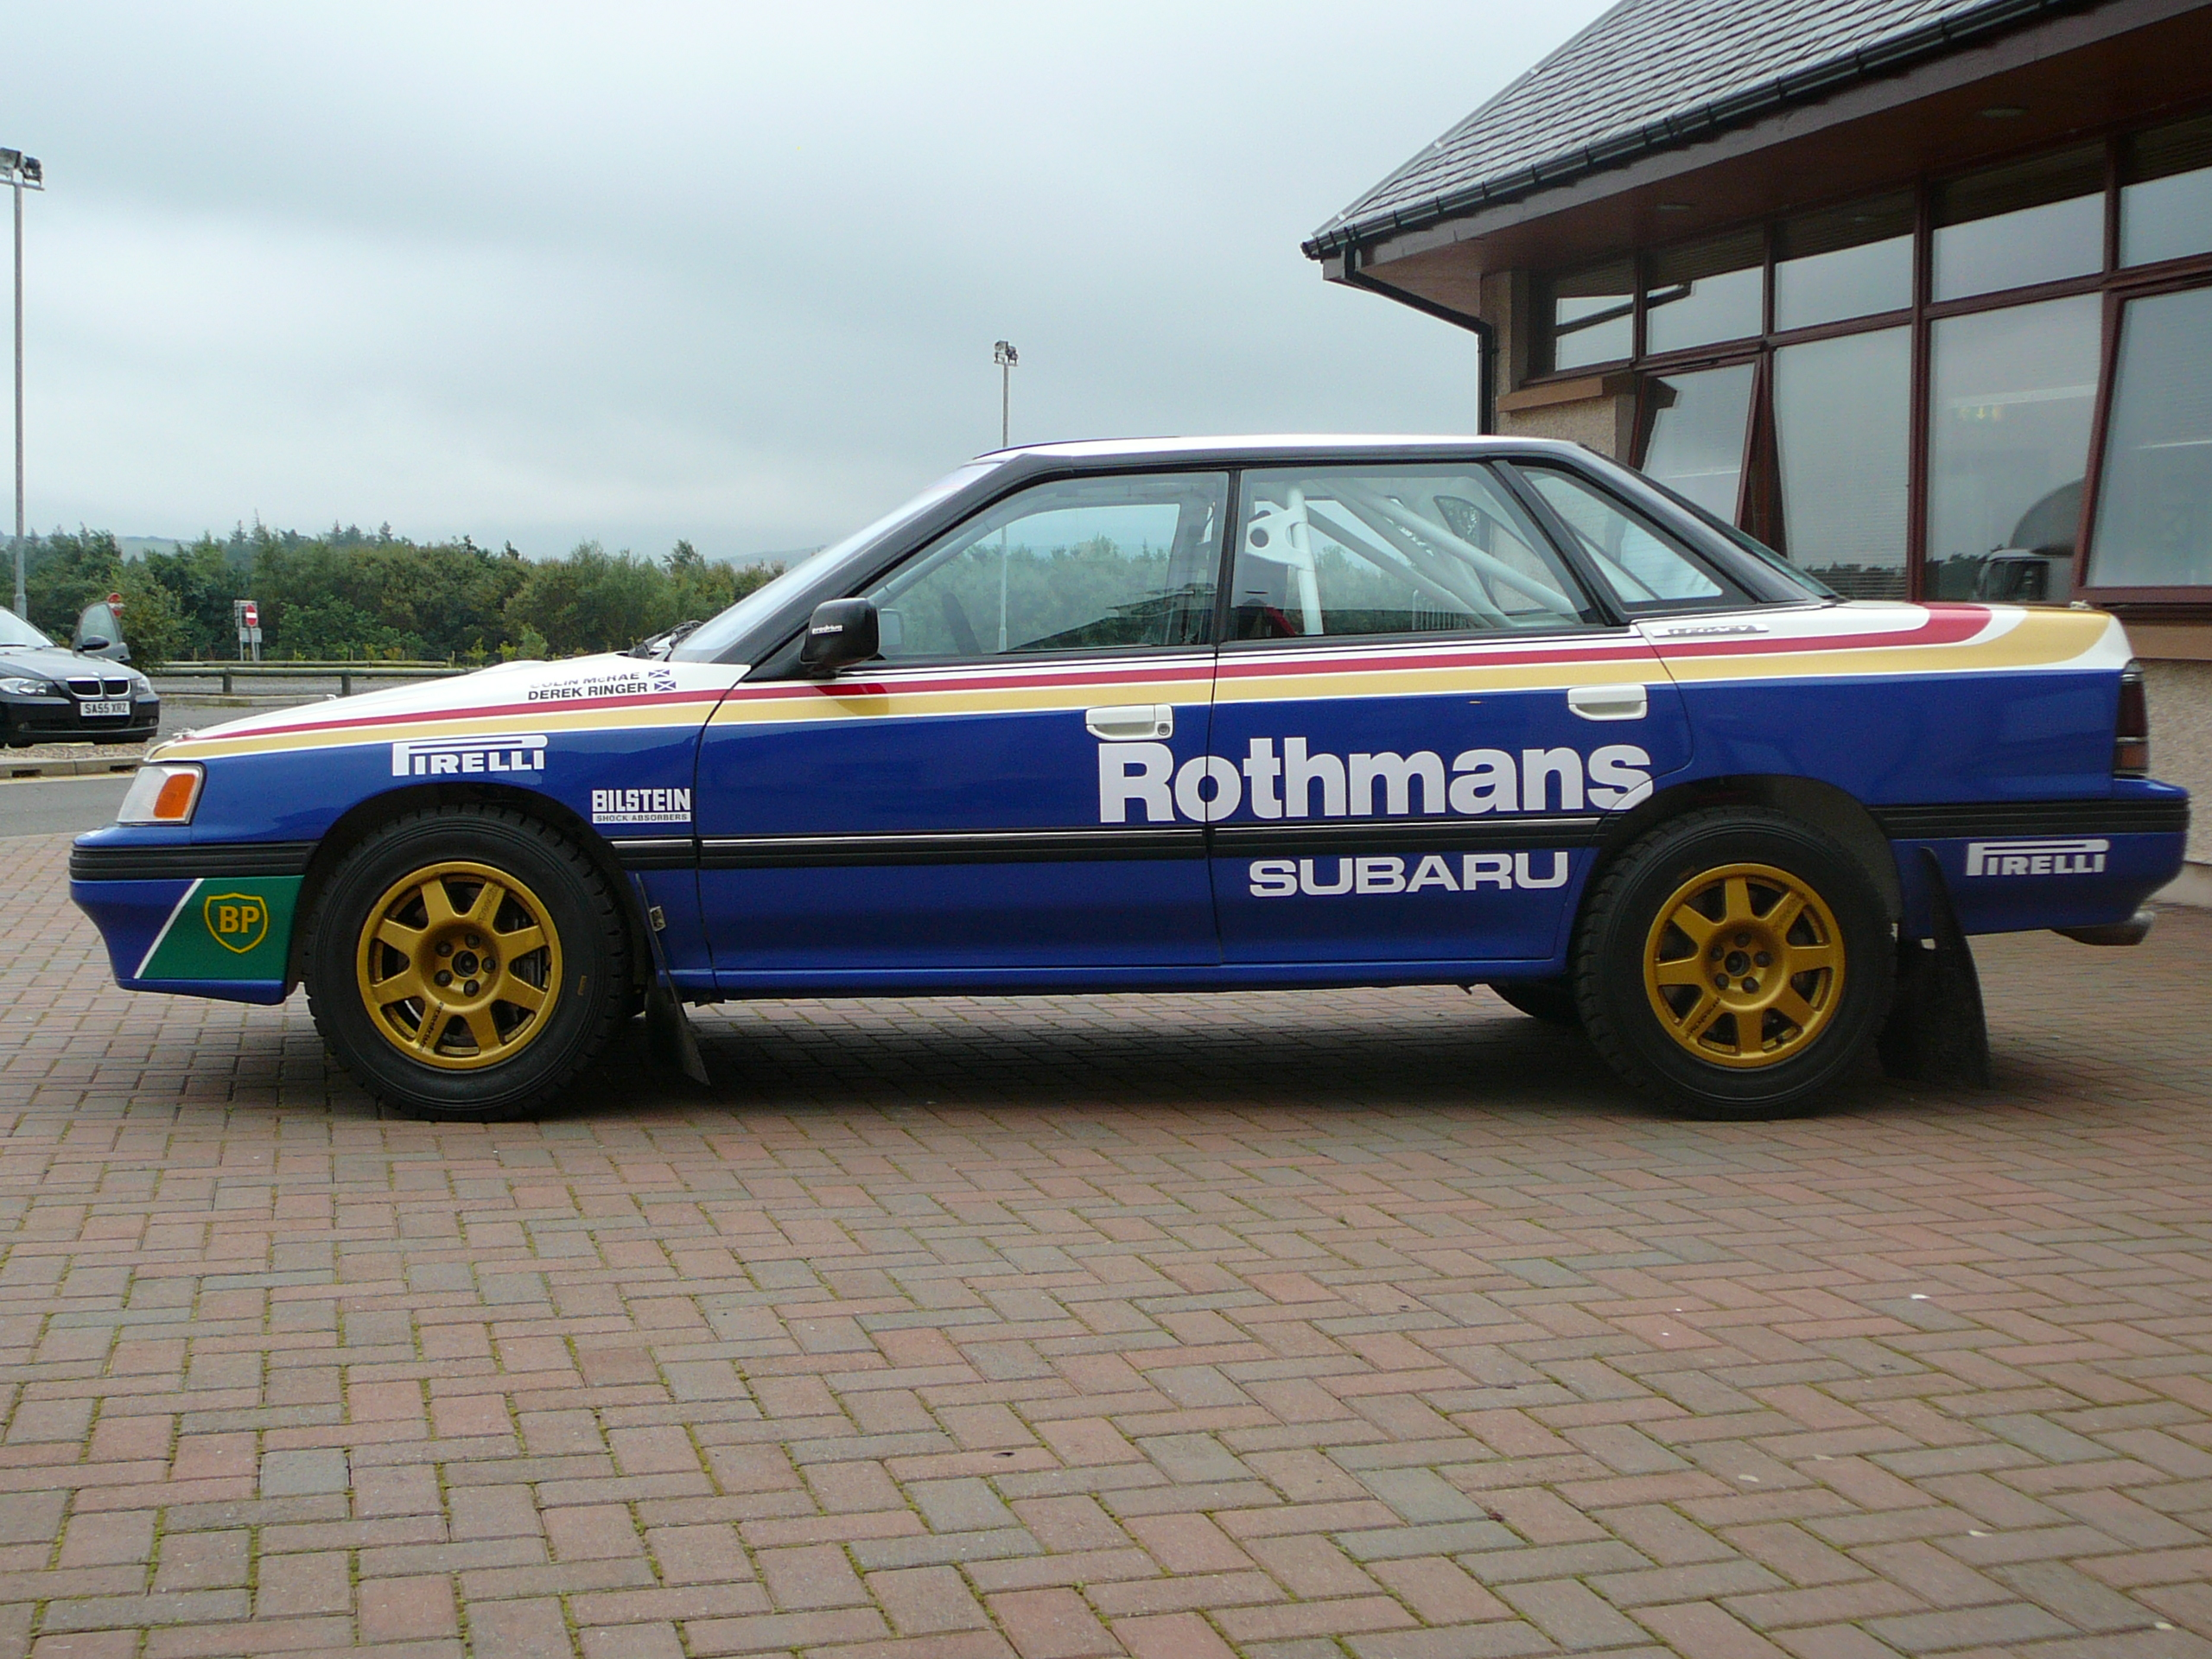 Subaru Rally Car >> File:Flickr - bjmullan - Colin McRae's Subaru Legacy Rally car.jpg - Wikimedia Commons